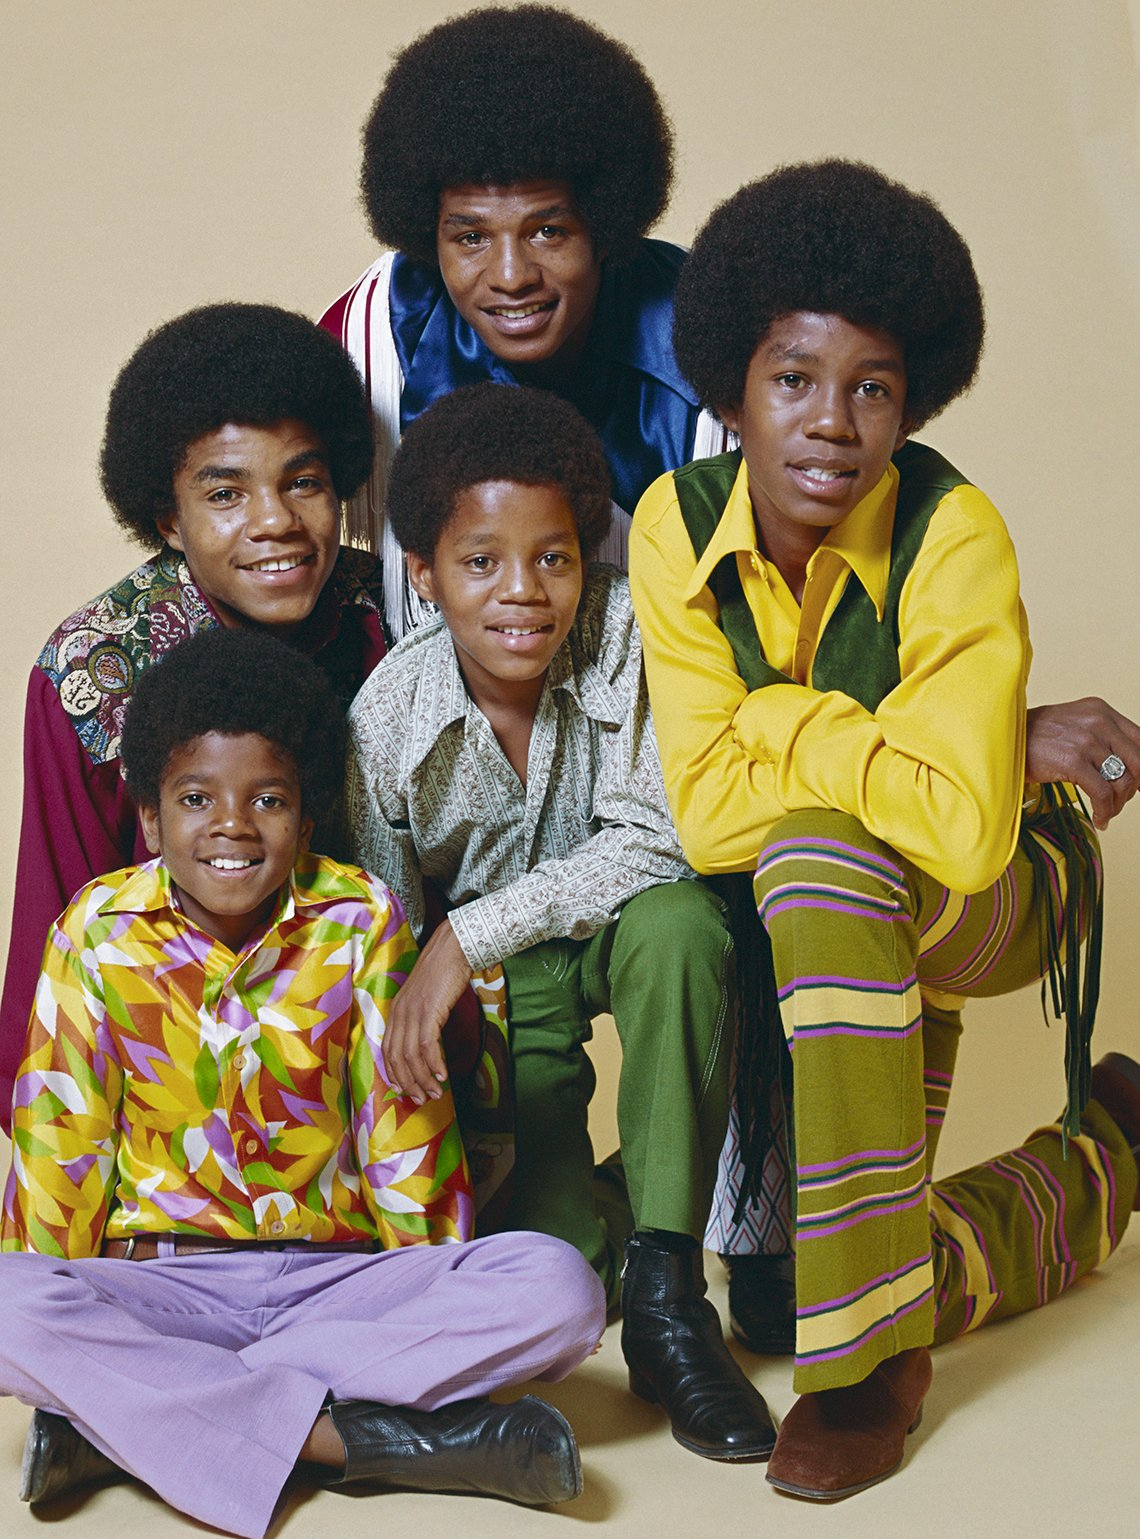 Grupo The Jackson 5, enero 1971